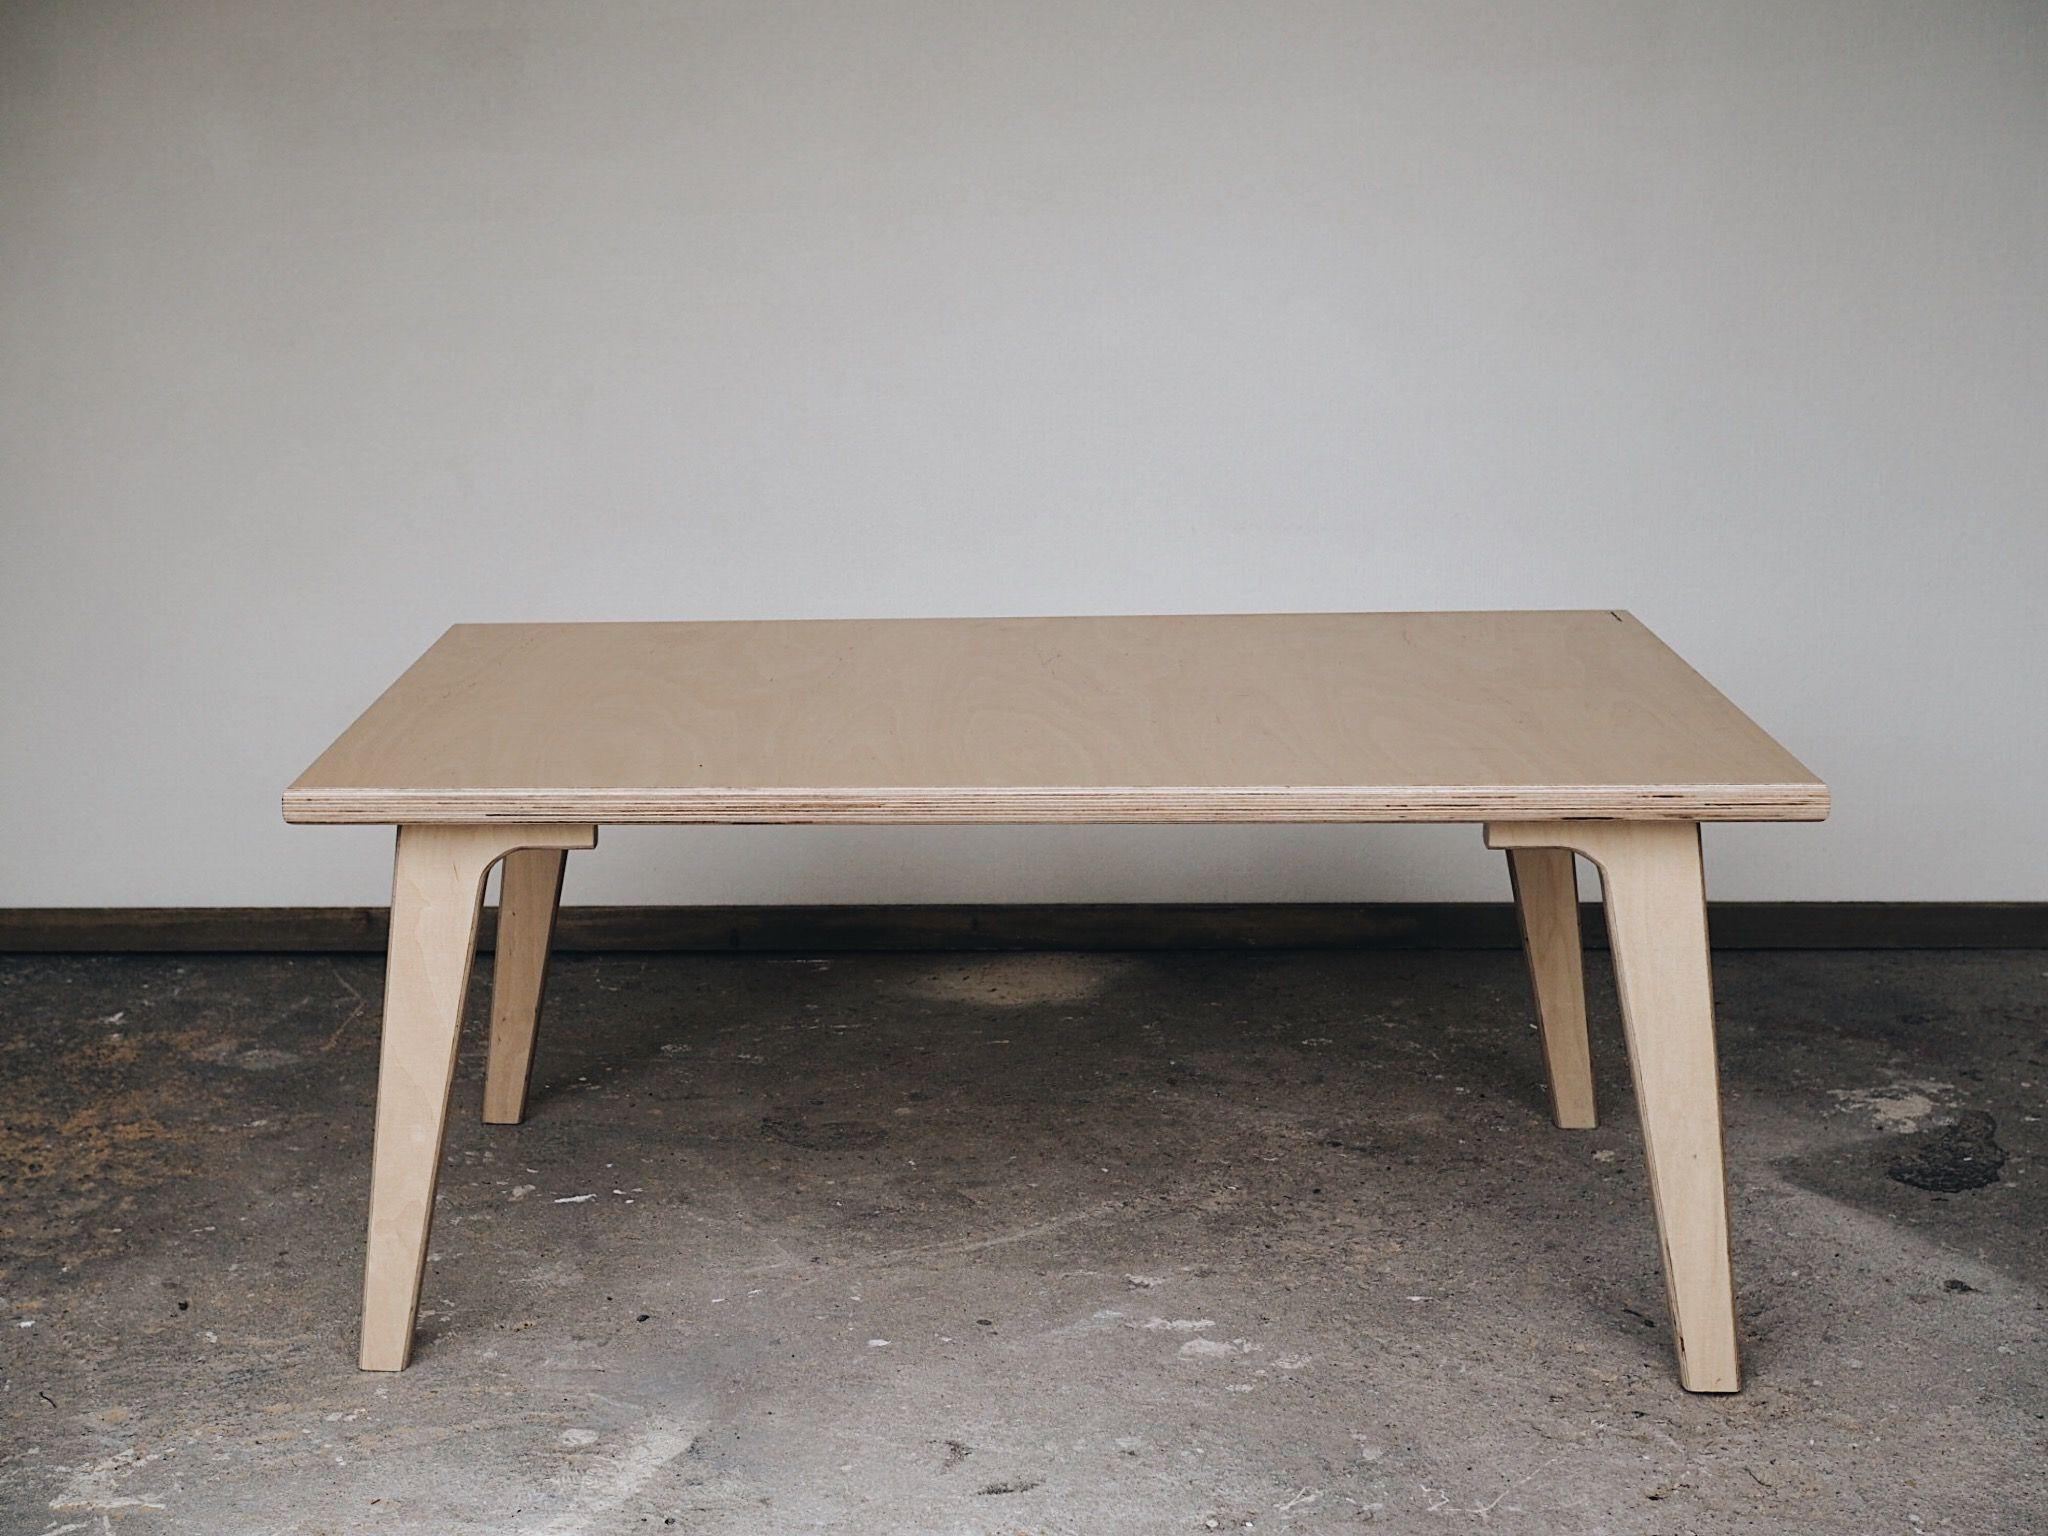 Henri Matias 110cm X 70cm X 45cm Birch Wood Coffee Table Handmade